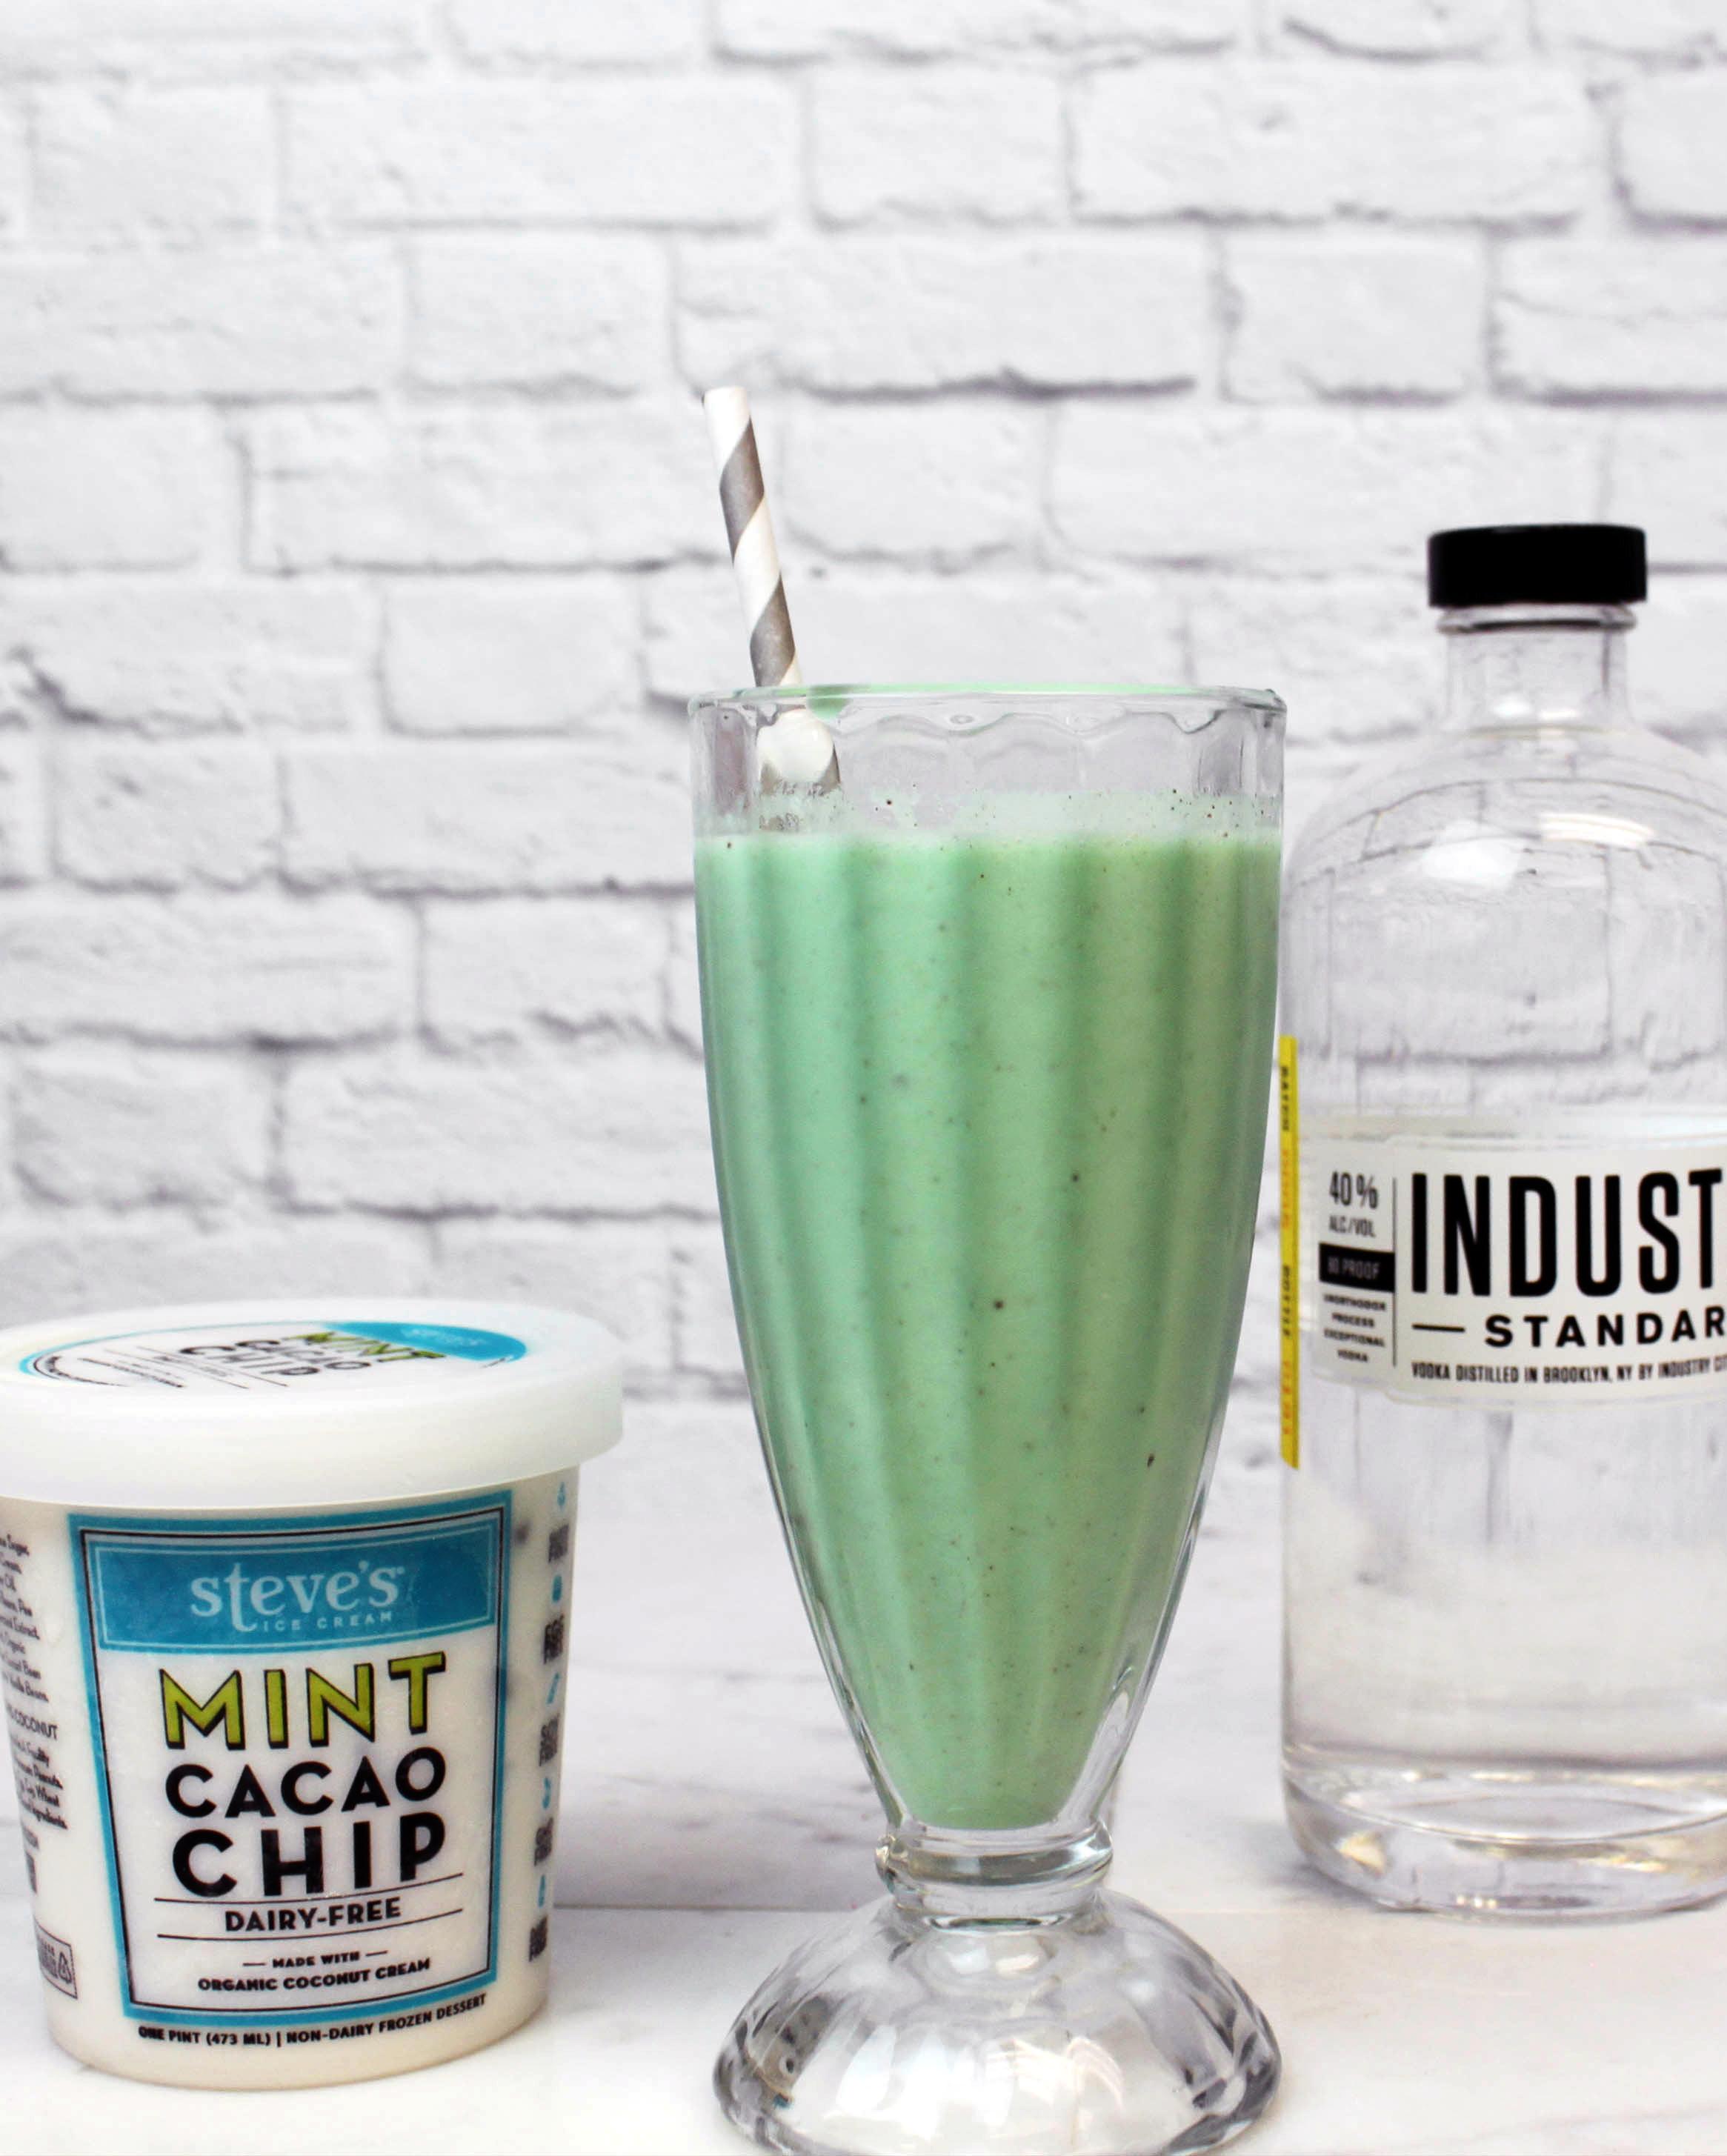 late-night-milkshake-creme-de-menthe-steves-ice-cream-2-0615.jpg